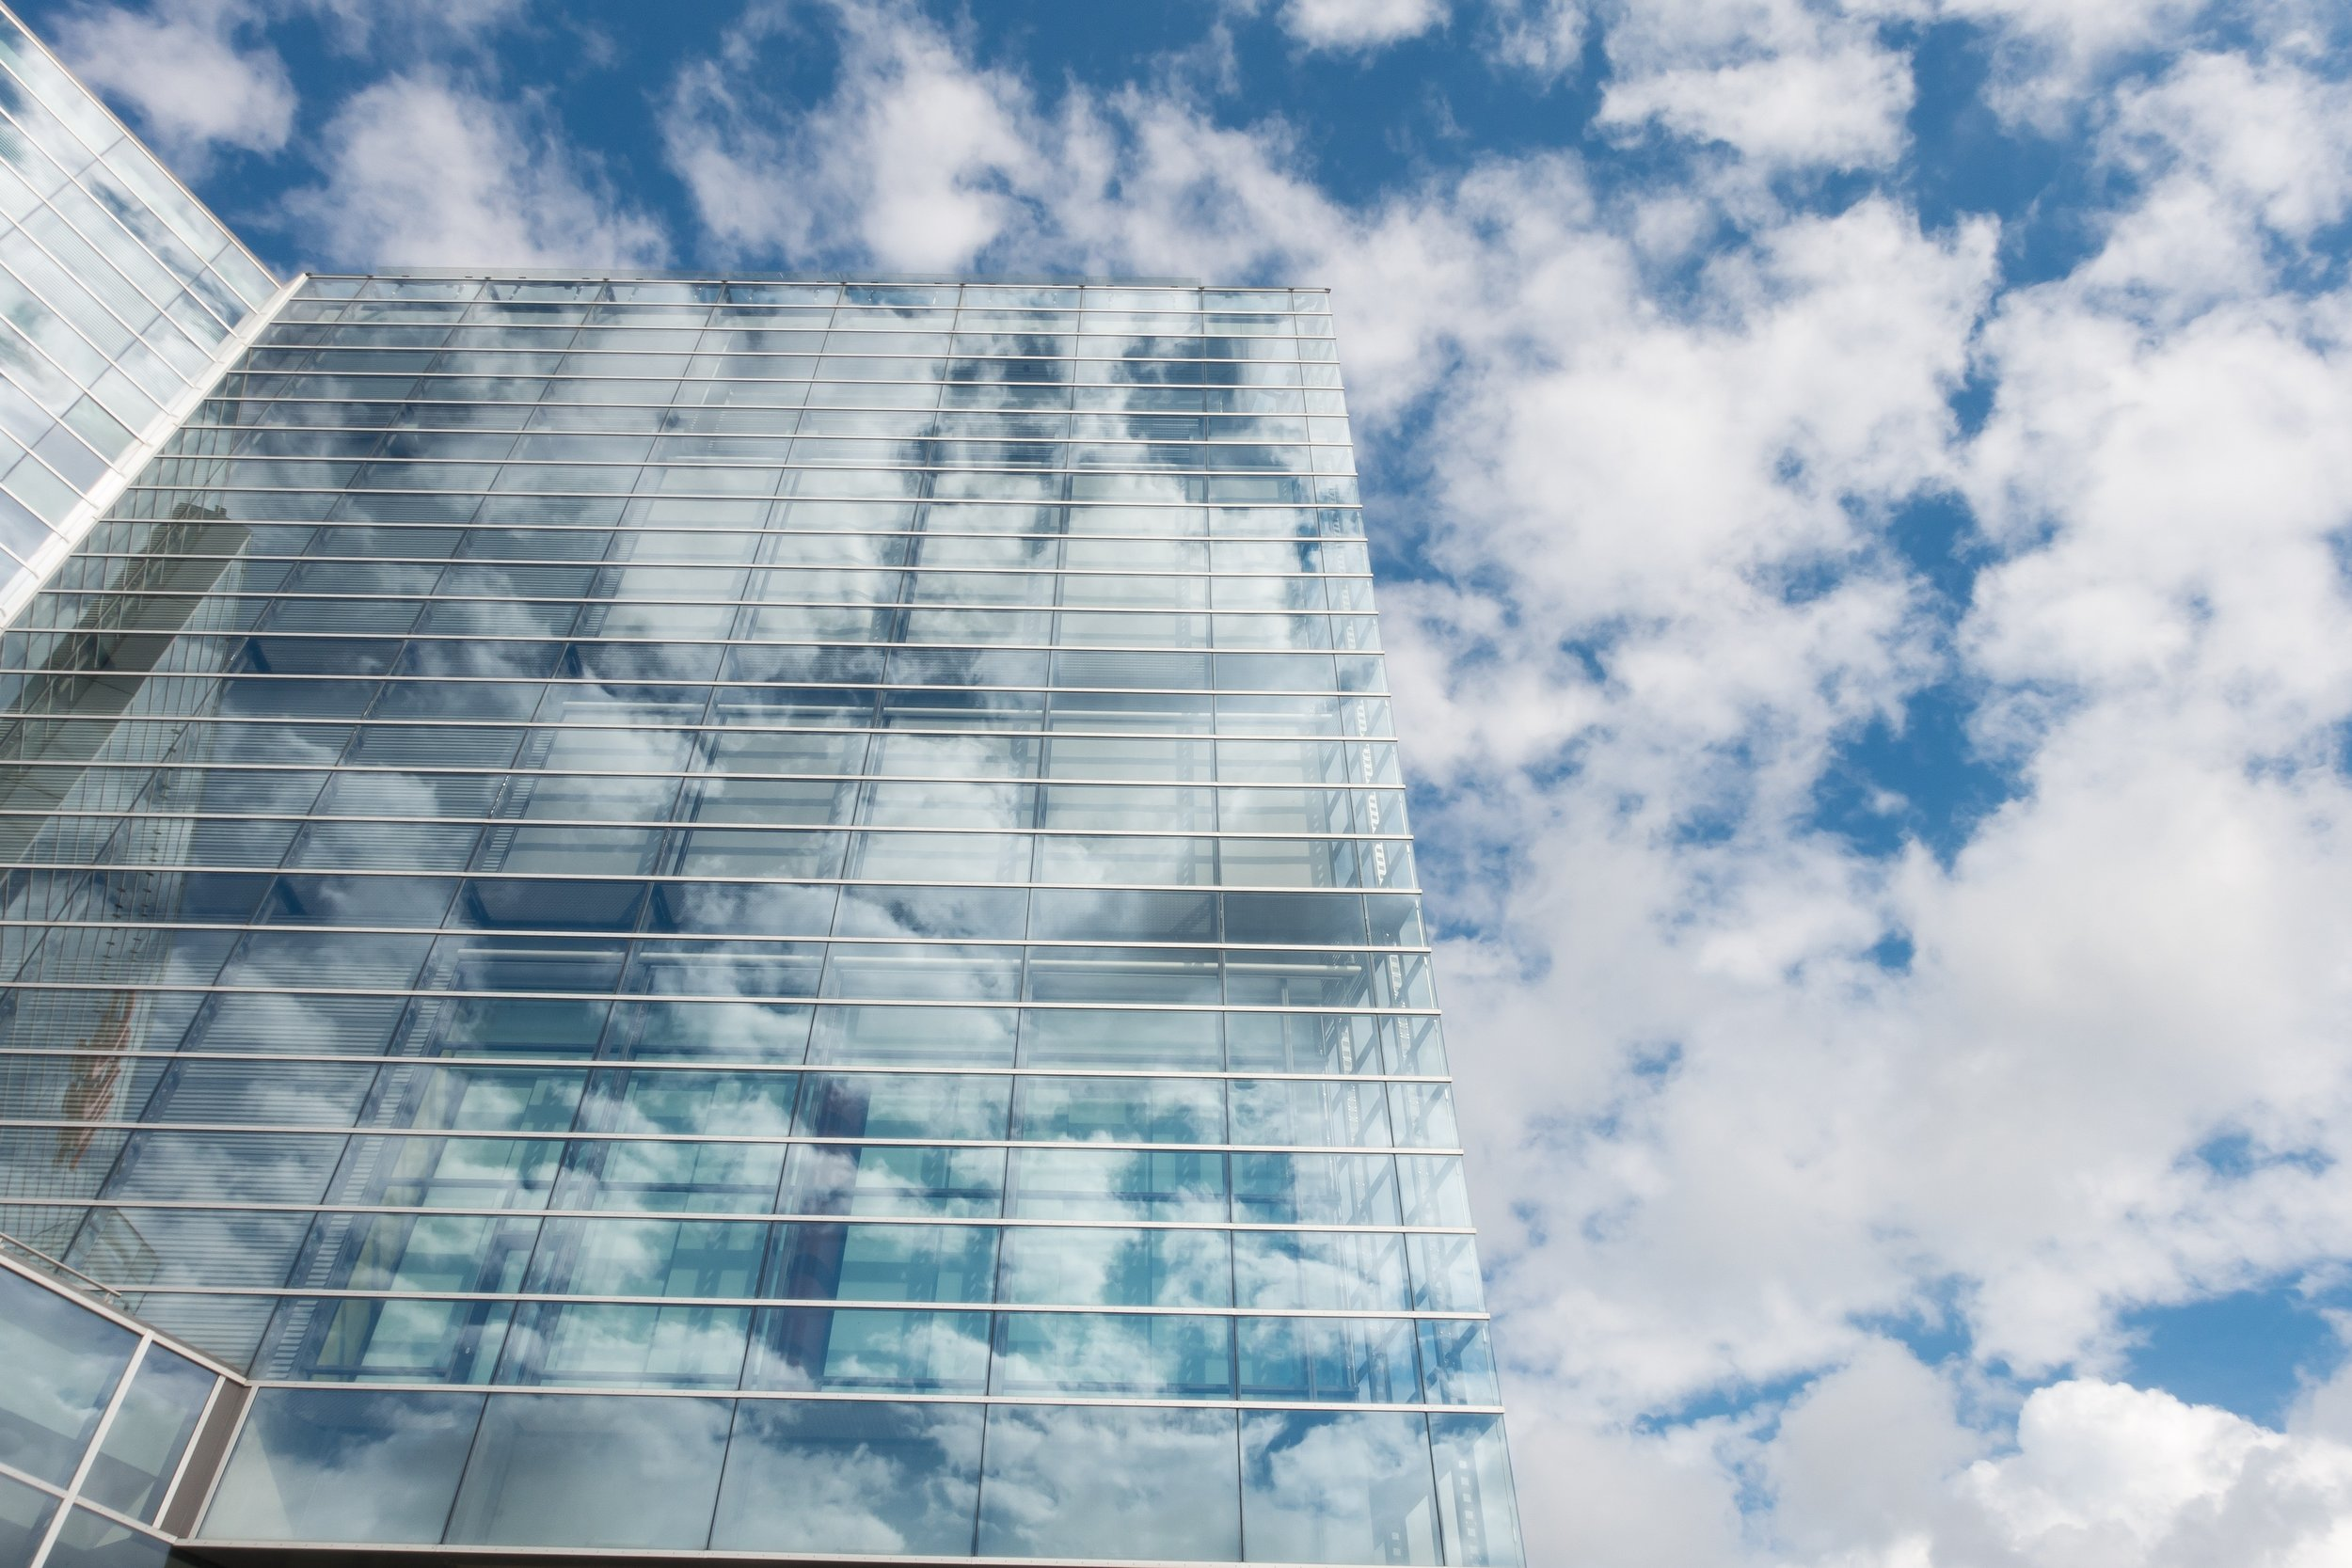 architecture-blue-building-164444.jpg